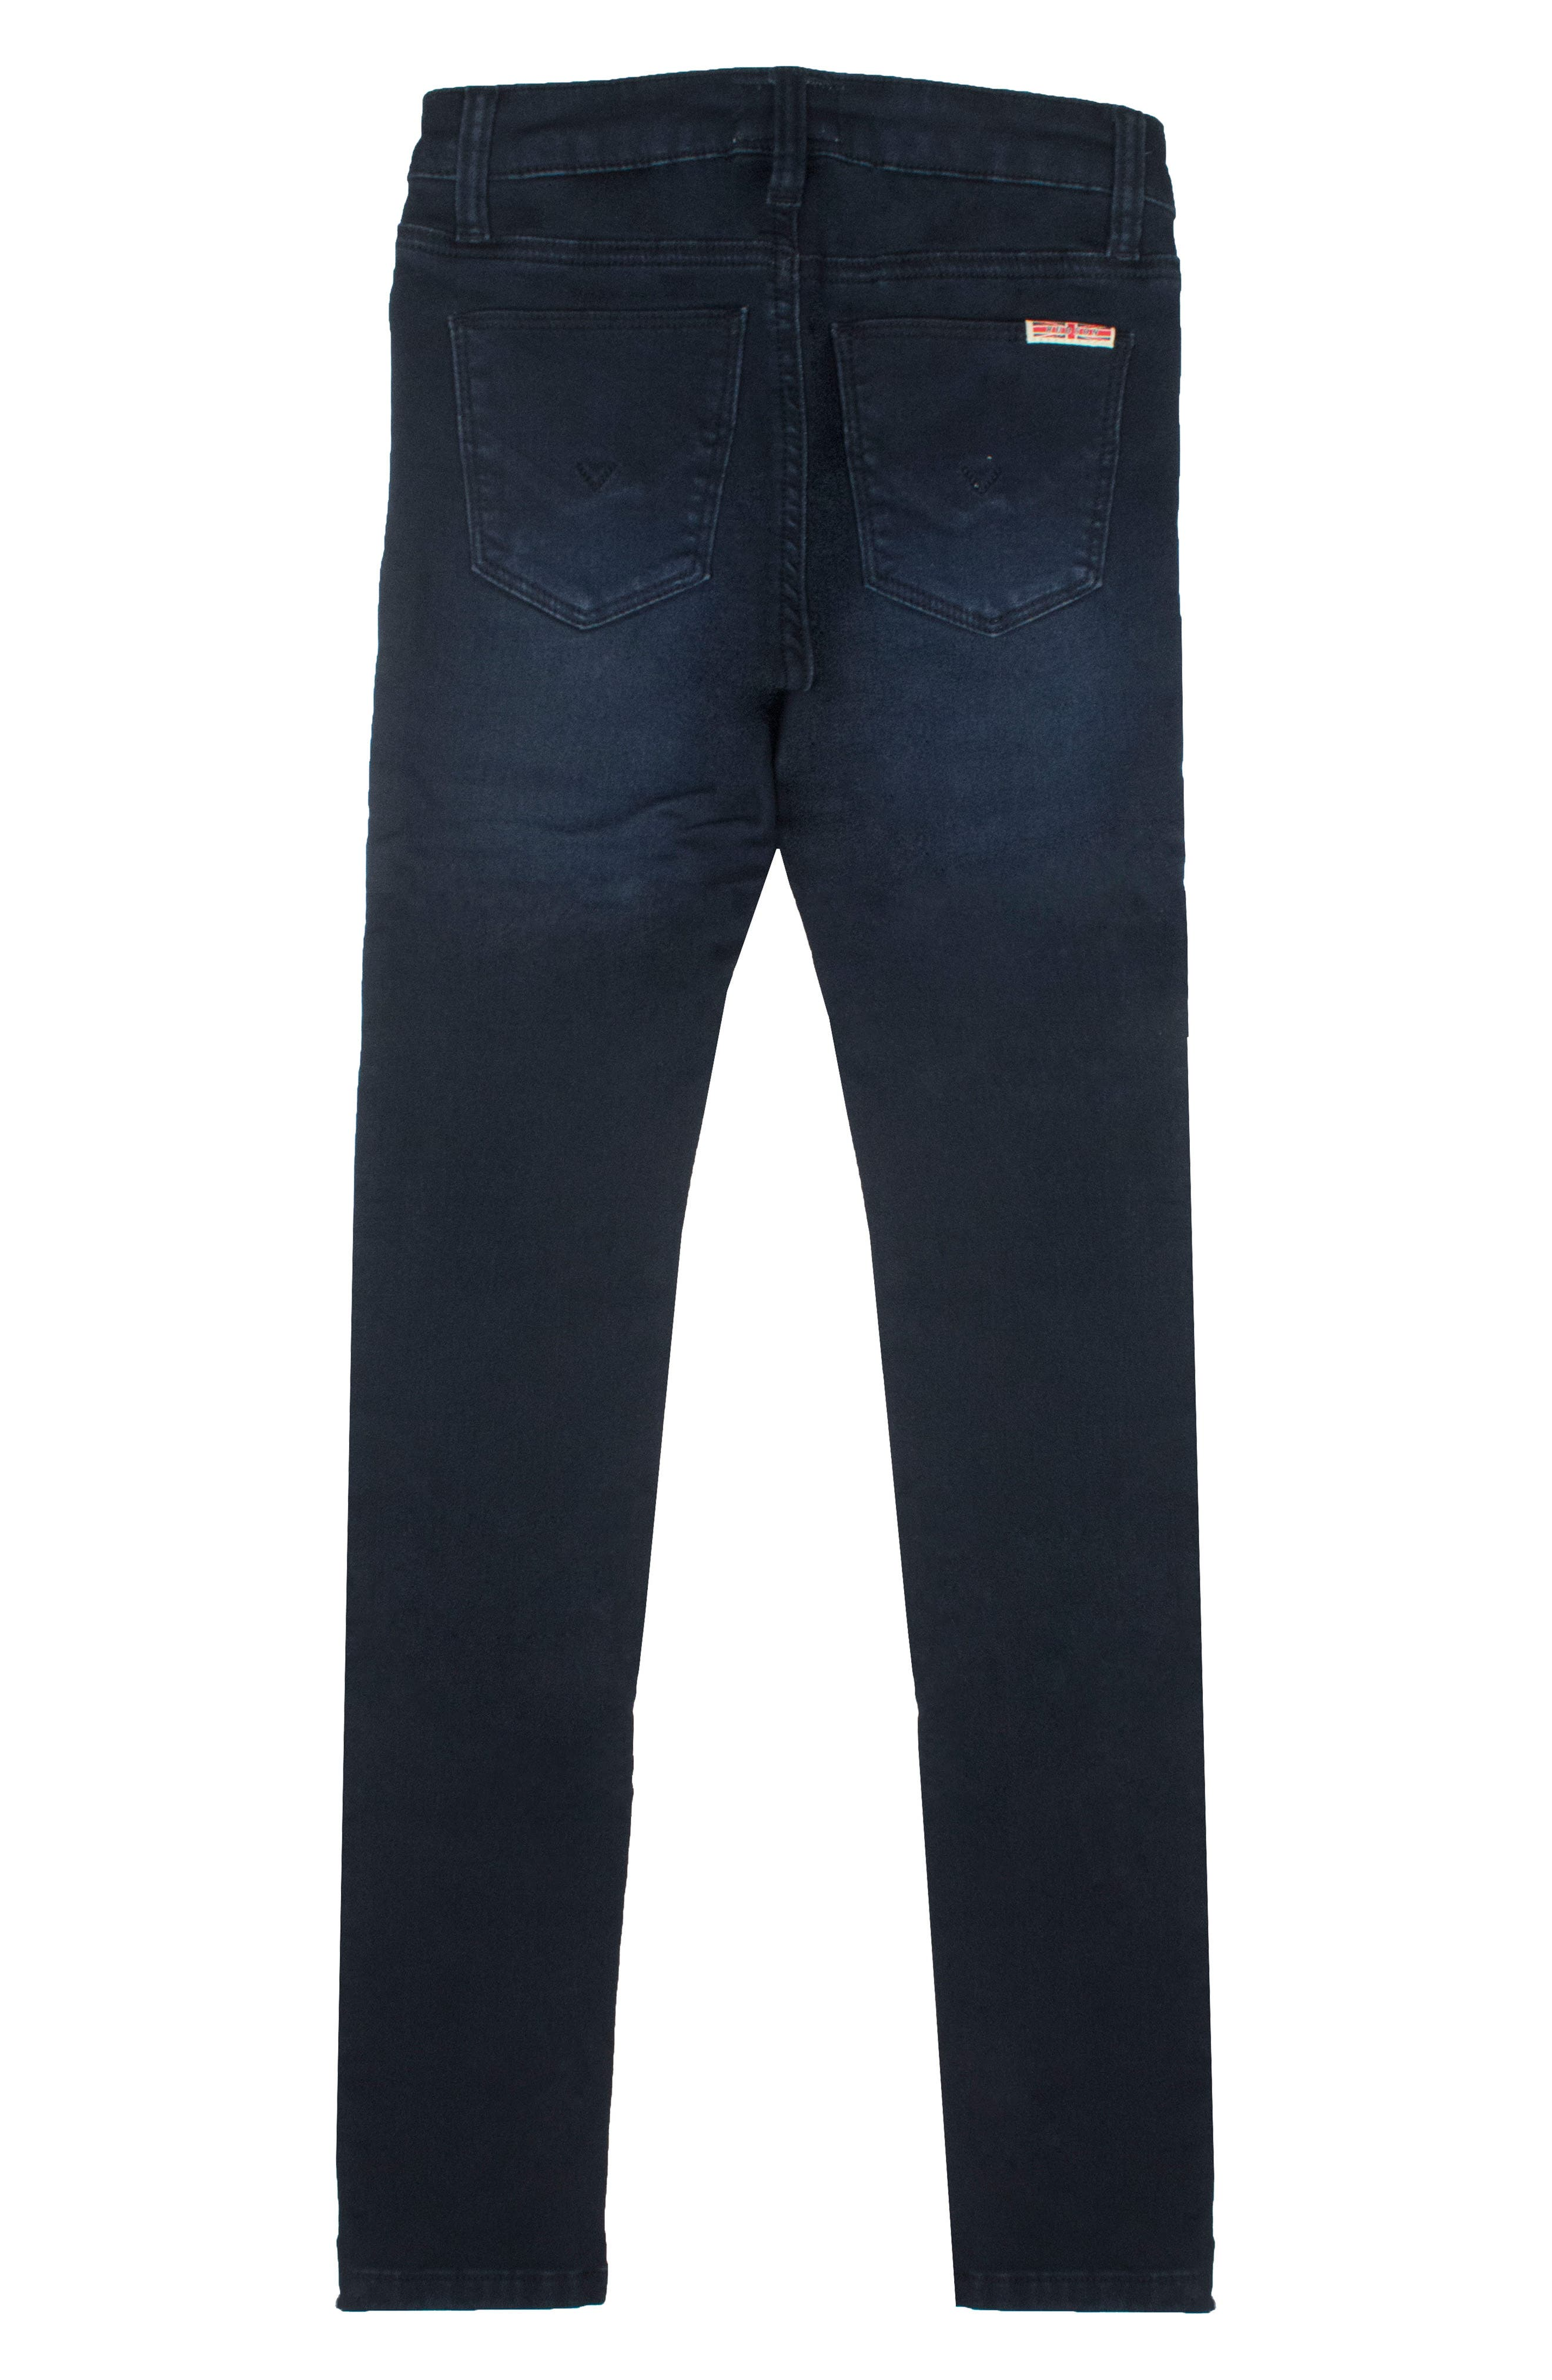 Alternate Image 2  - Hudson Kids Collin Flap Pocket Skinny Jeans (Toddler Girls & Little Girls)